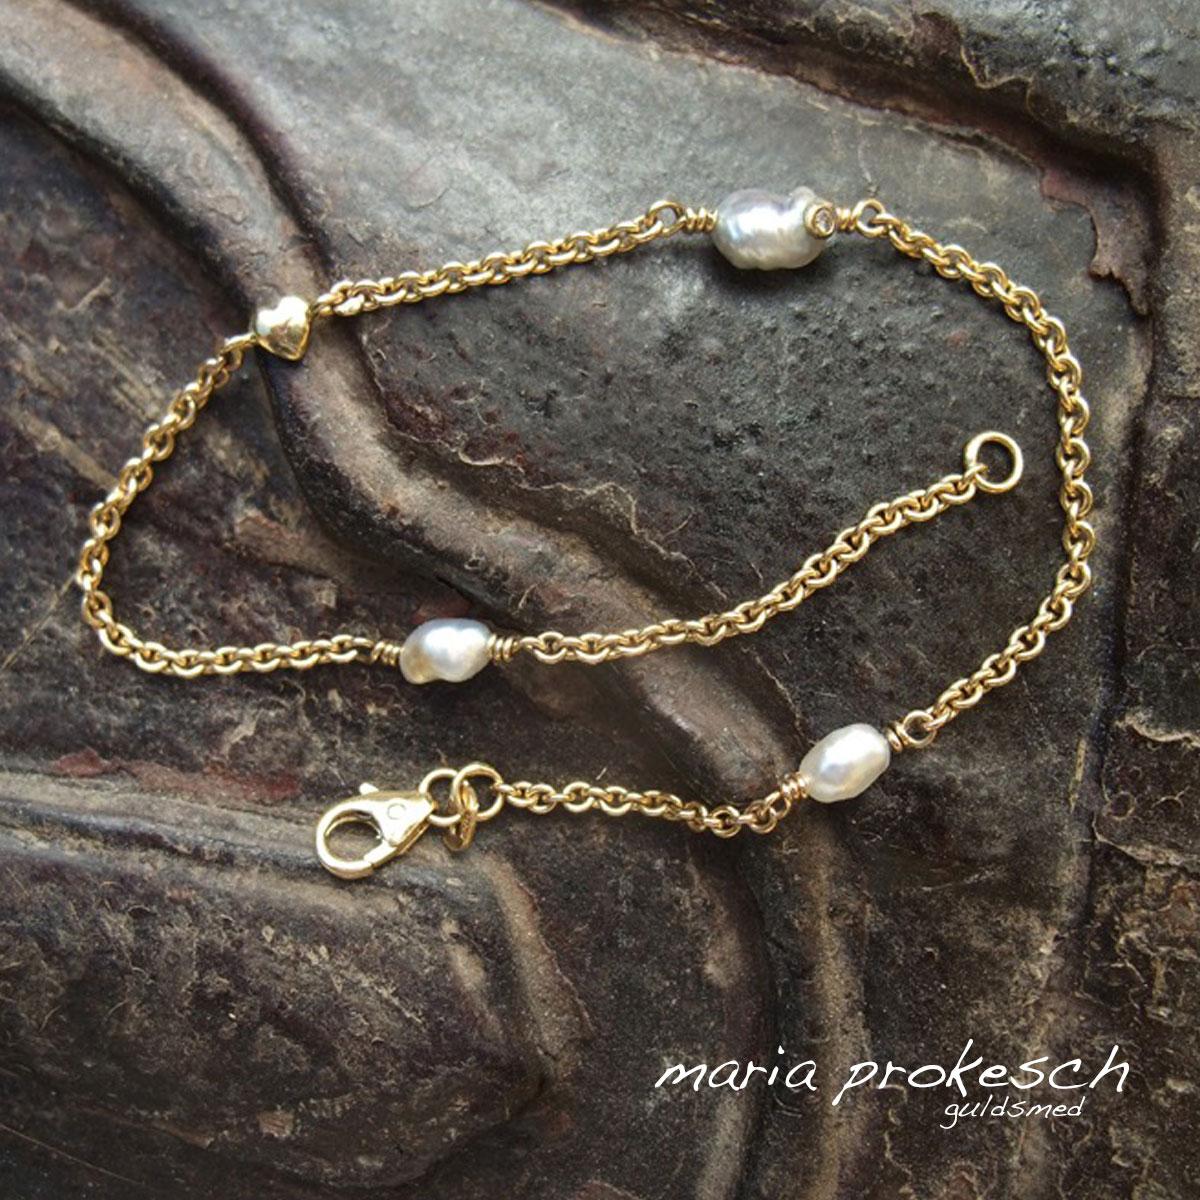 Armbånd i 14 kt guld, helt enkelt med hvide keshi perler fra South See, et lille hjerte og en diamant i den ene perle.